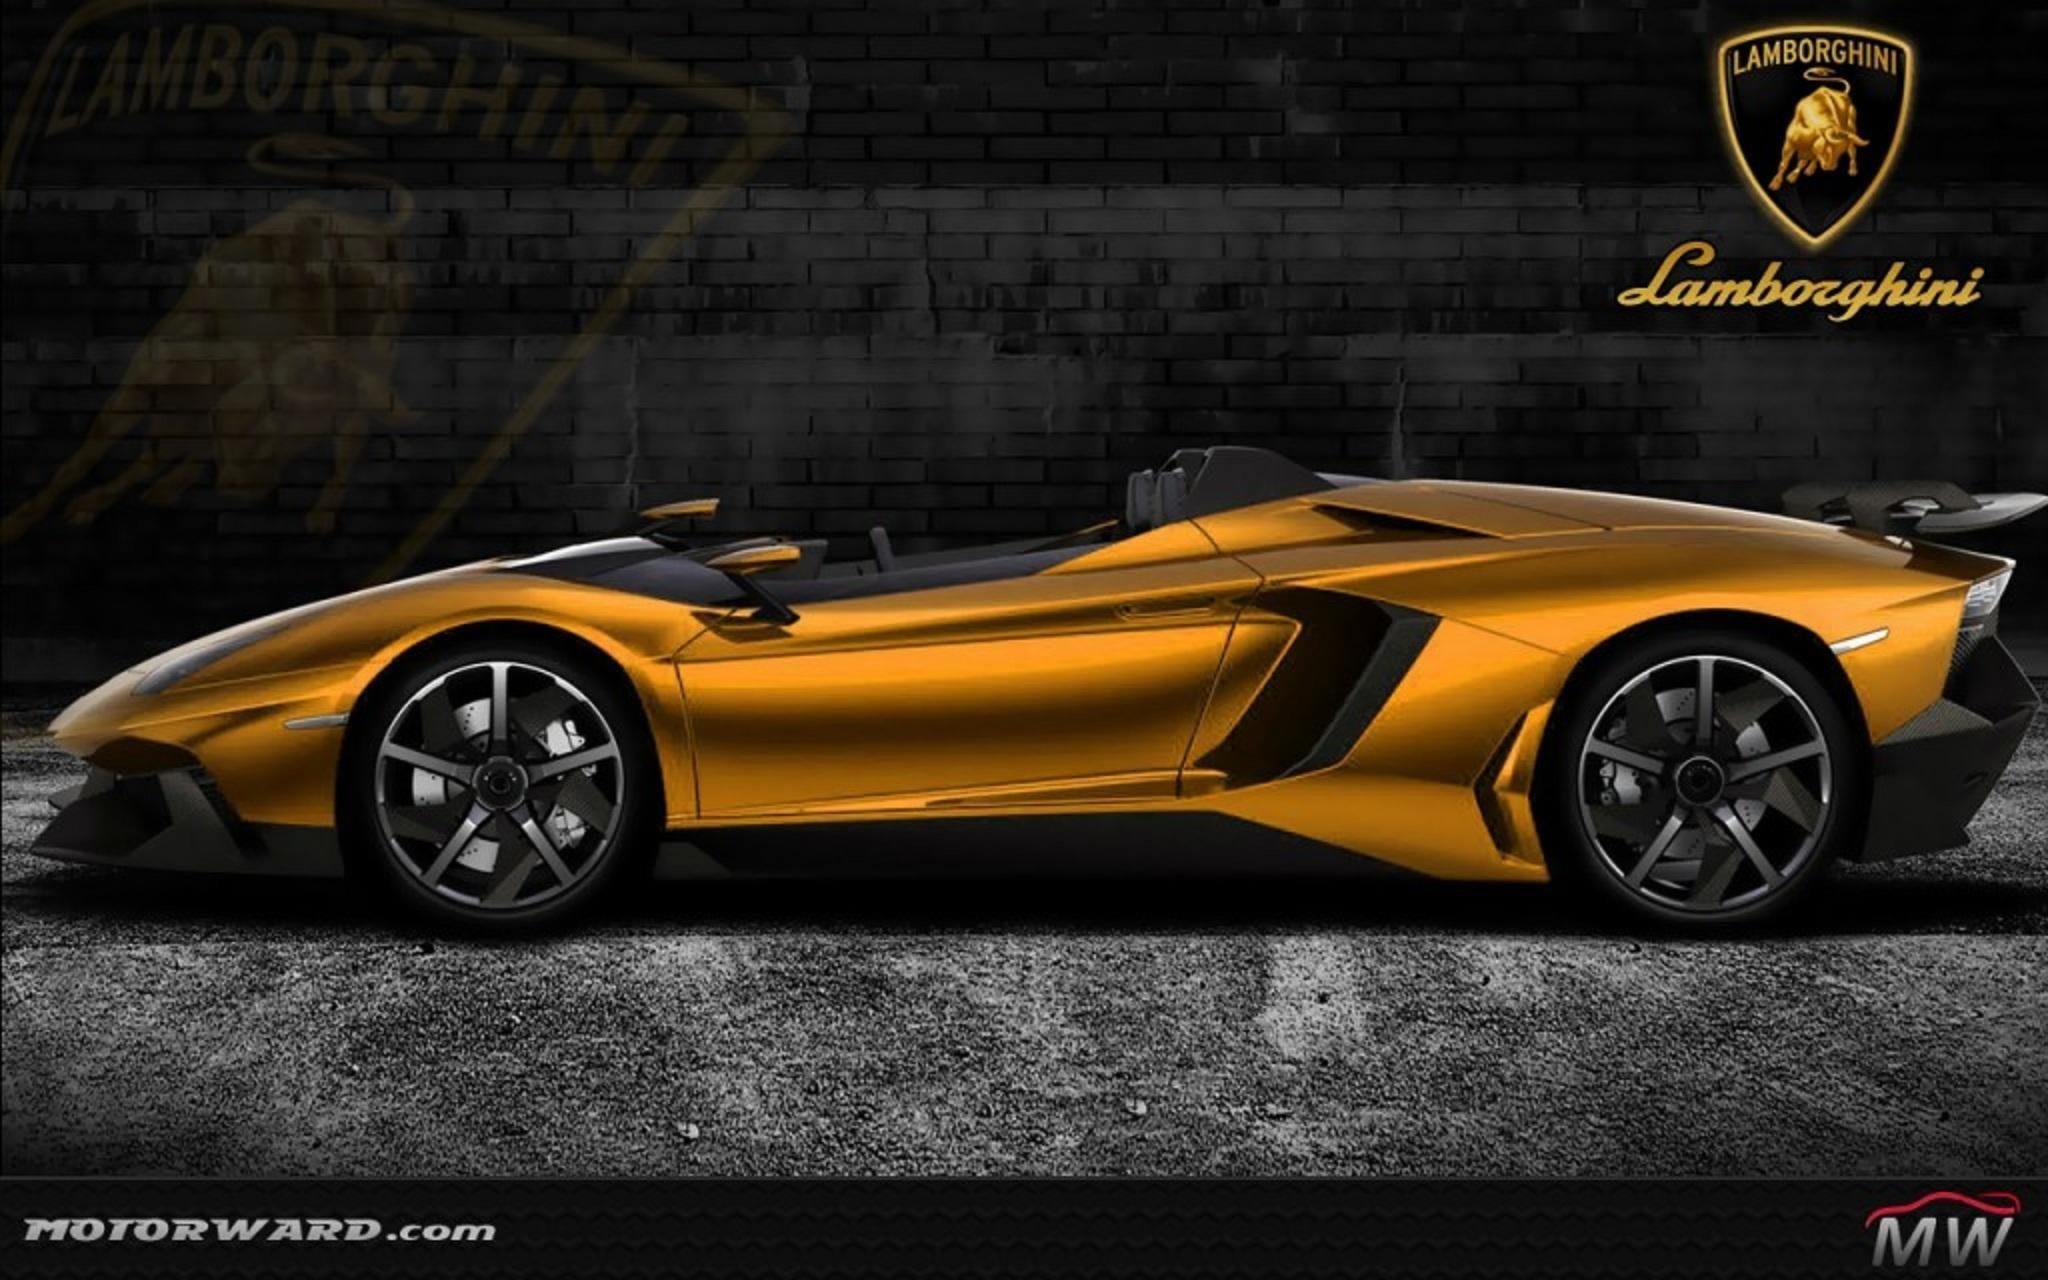 Res: 2048x1280, Lamborghini Aventador J